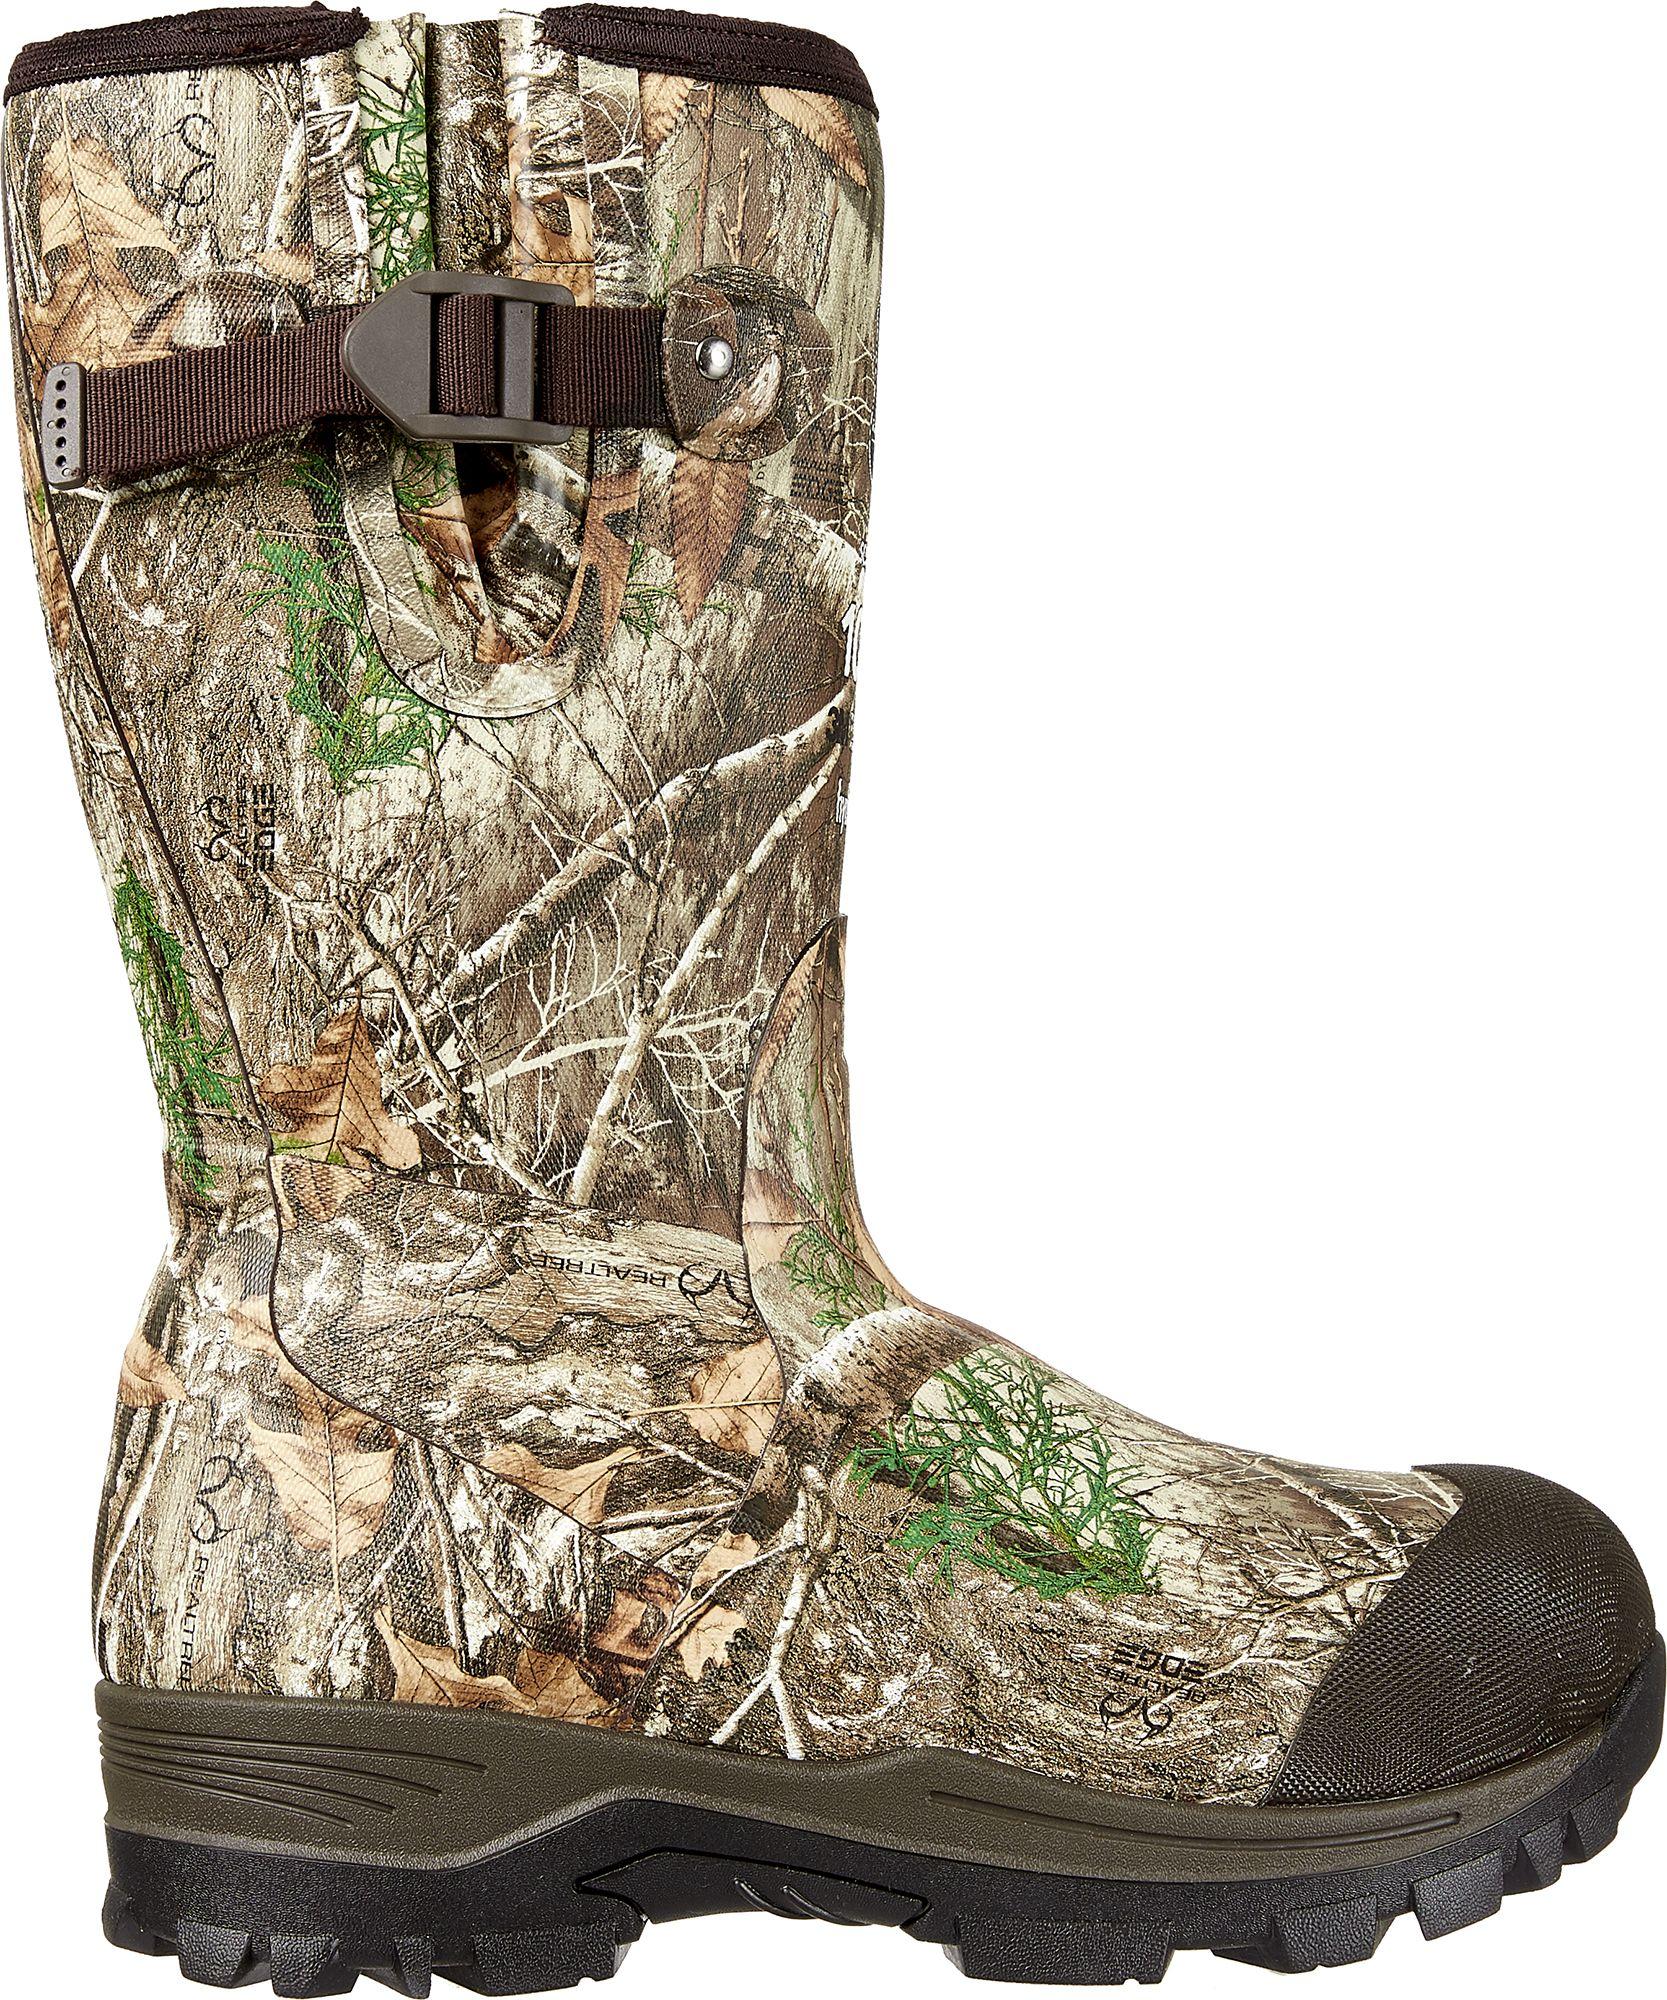 Field & Stream Women's Swamptracker 1000g RTE Rubber Hunting Boots, Multi